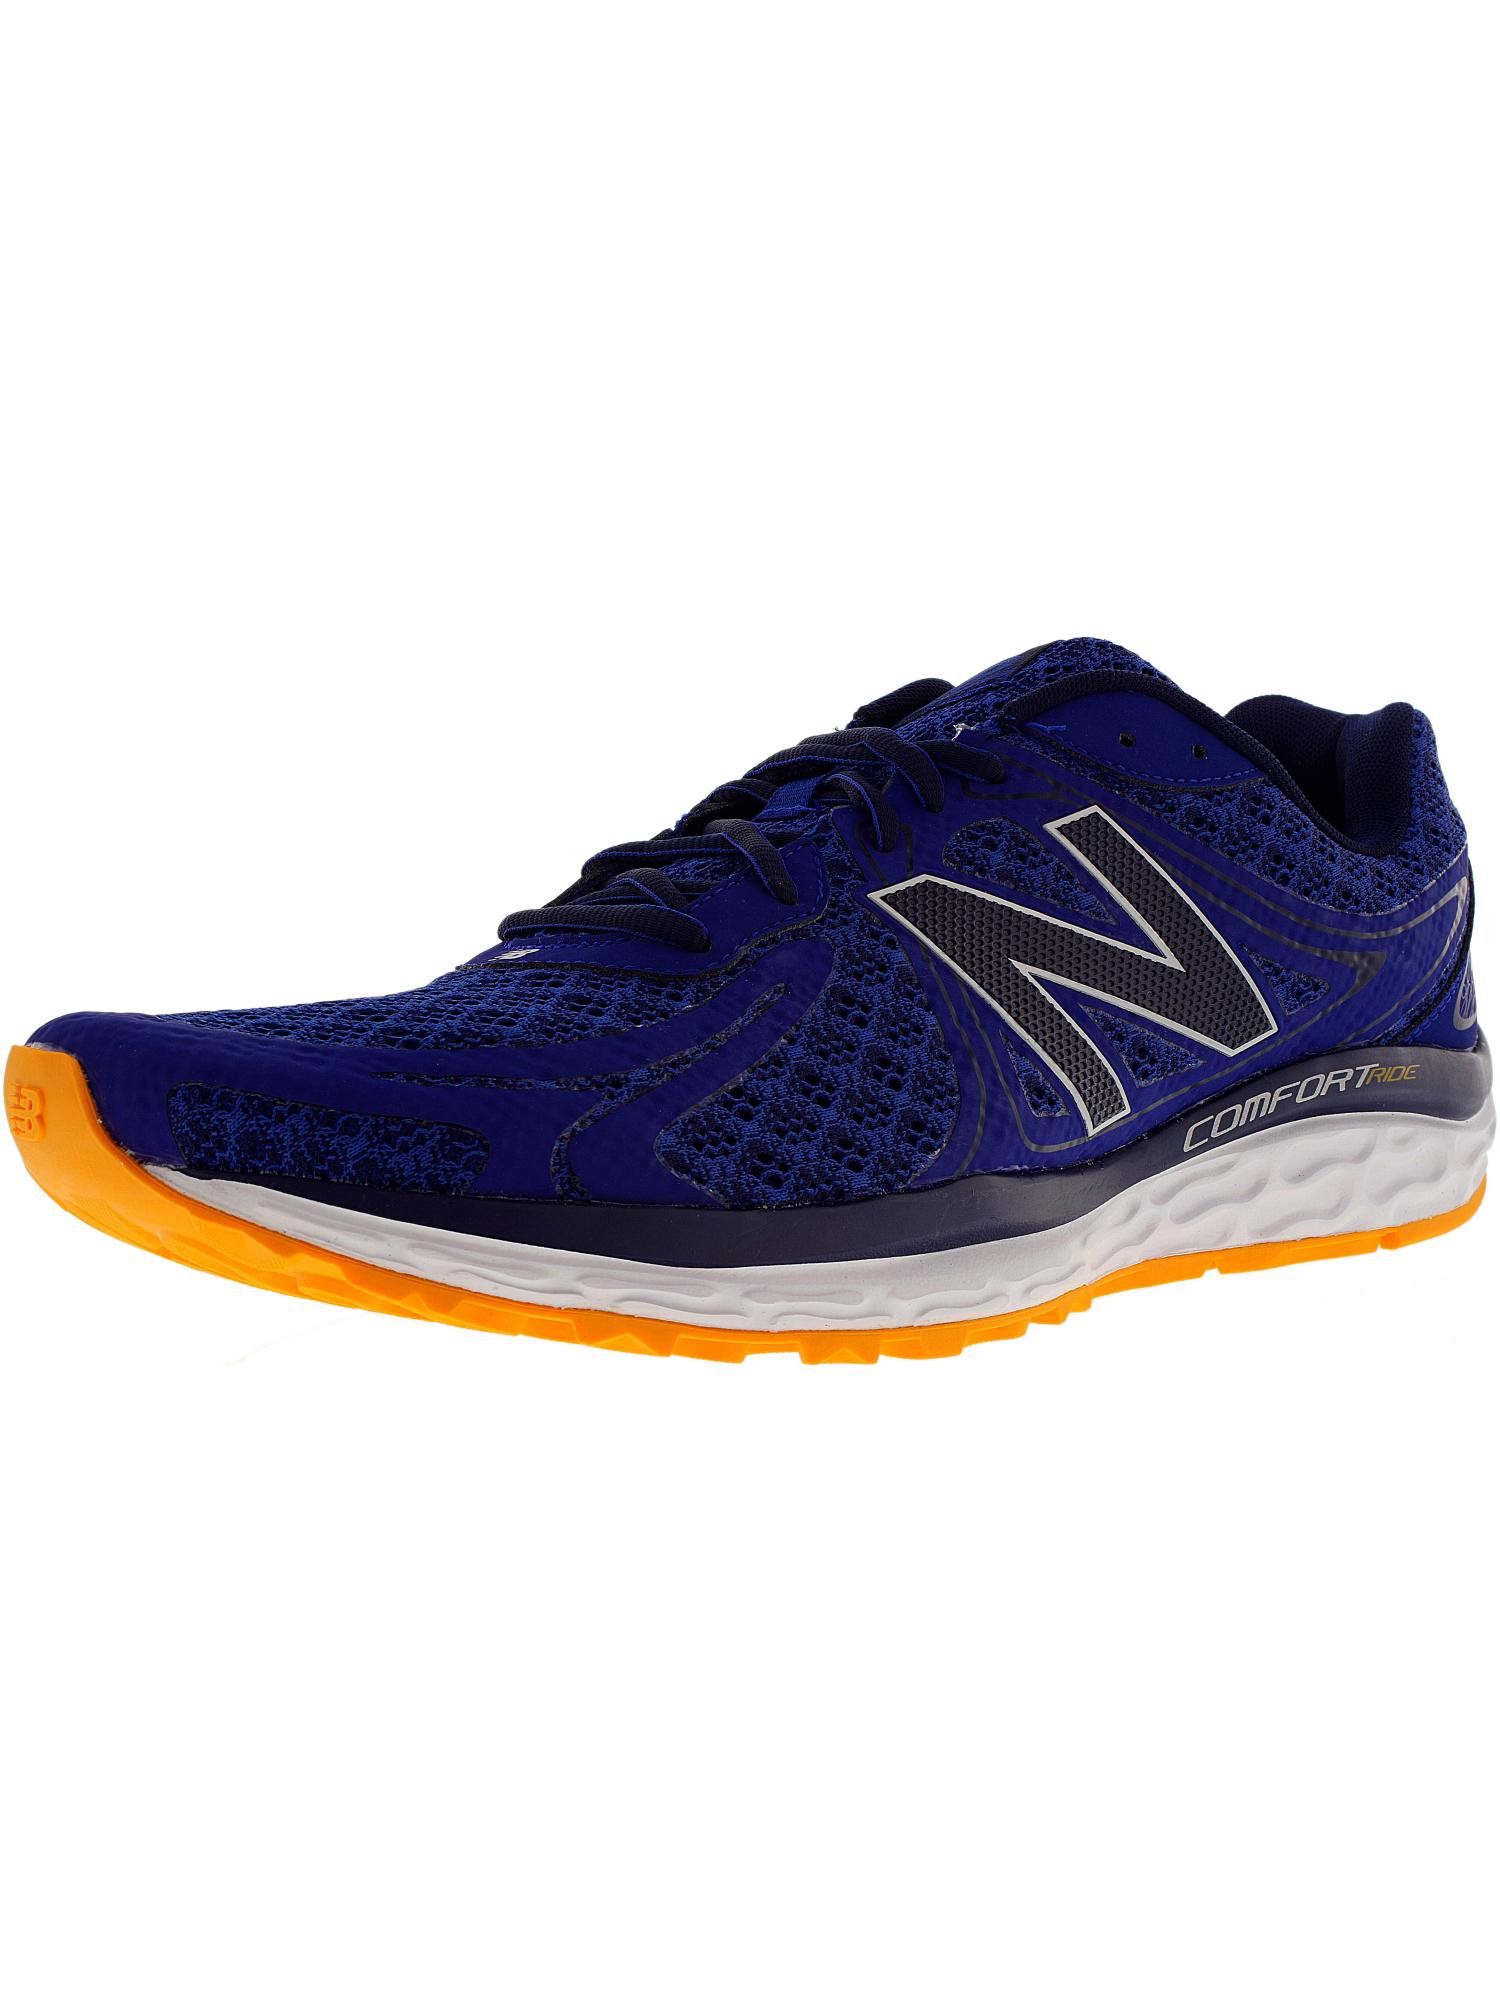 new products 66d31 3d0e8 ... New Balance Balance Balance Men s M720 Ankle-High Running Shoe e11f43  ...